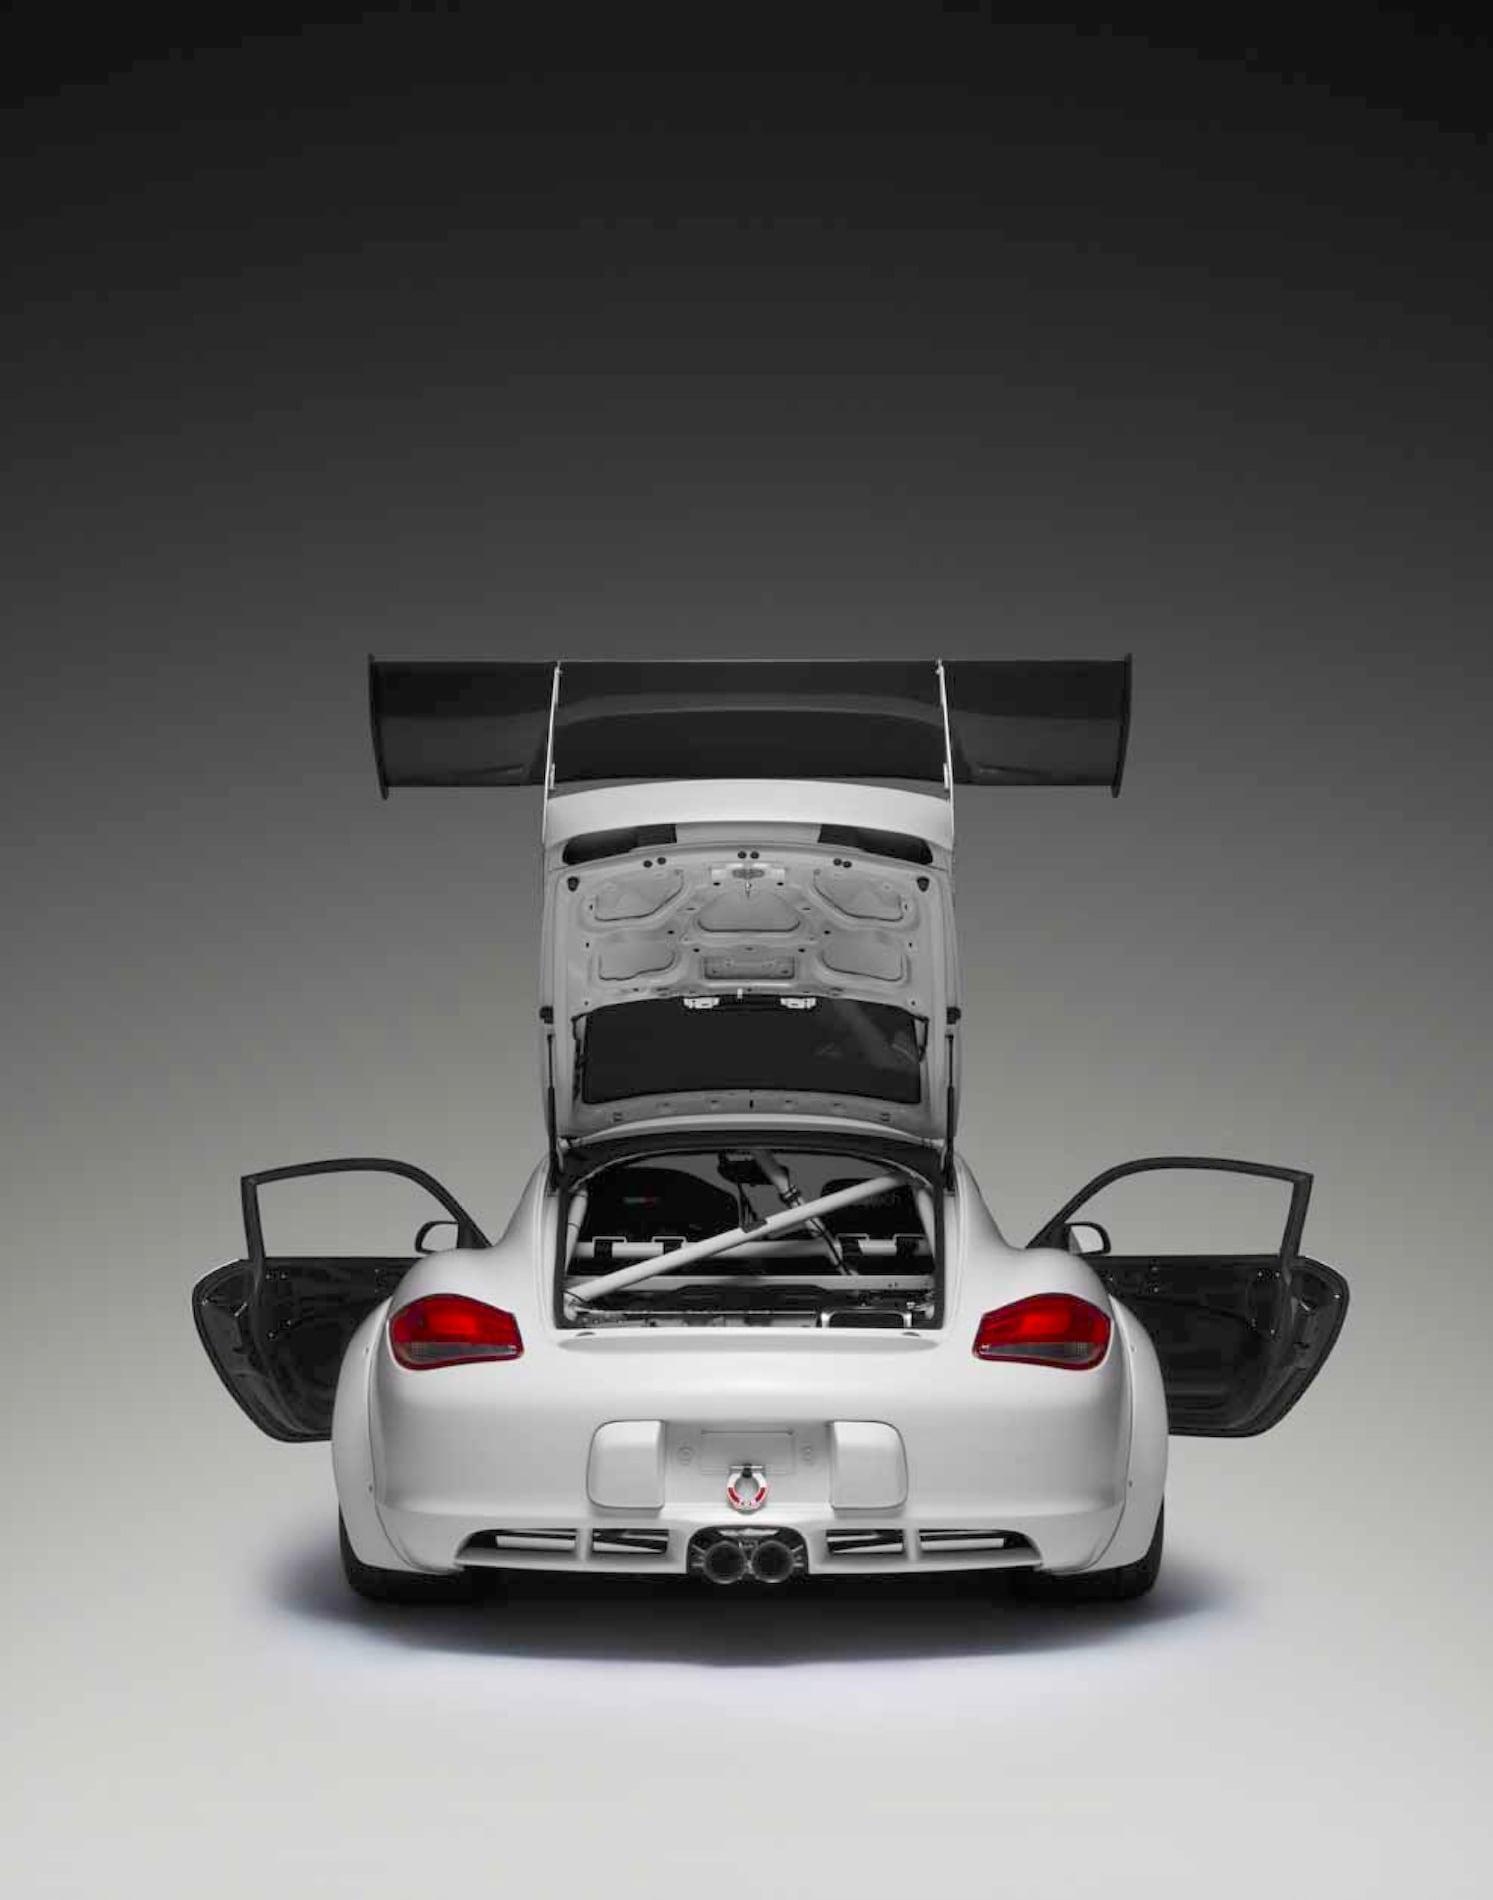 Cayman Rsr Deman Motorsport